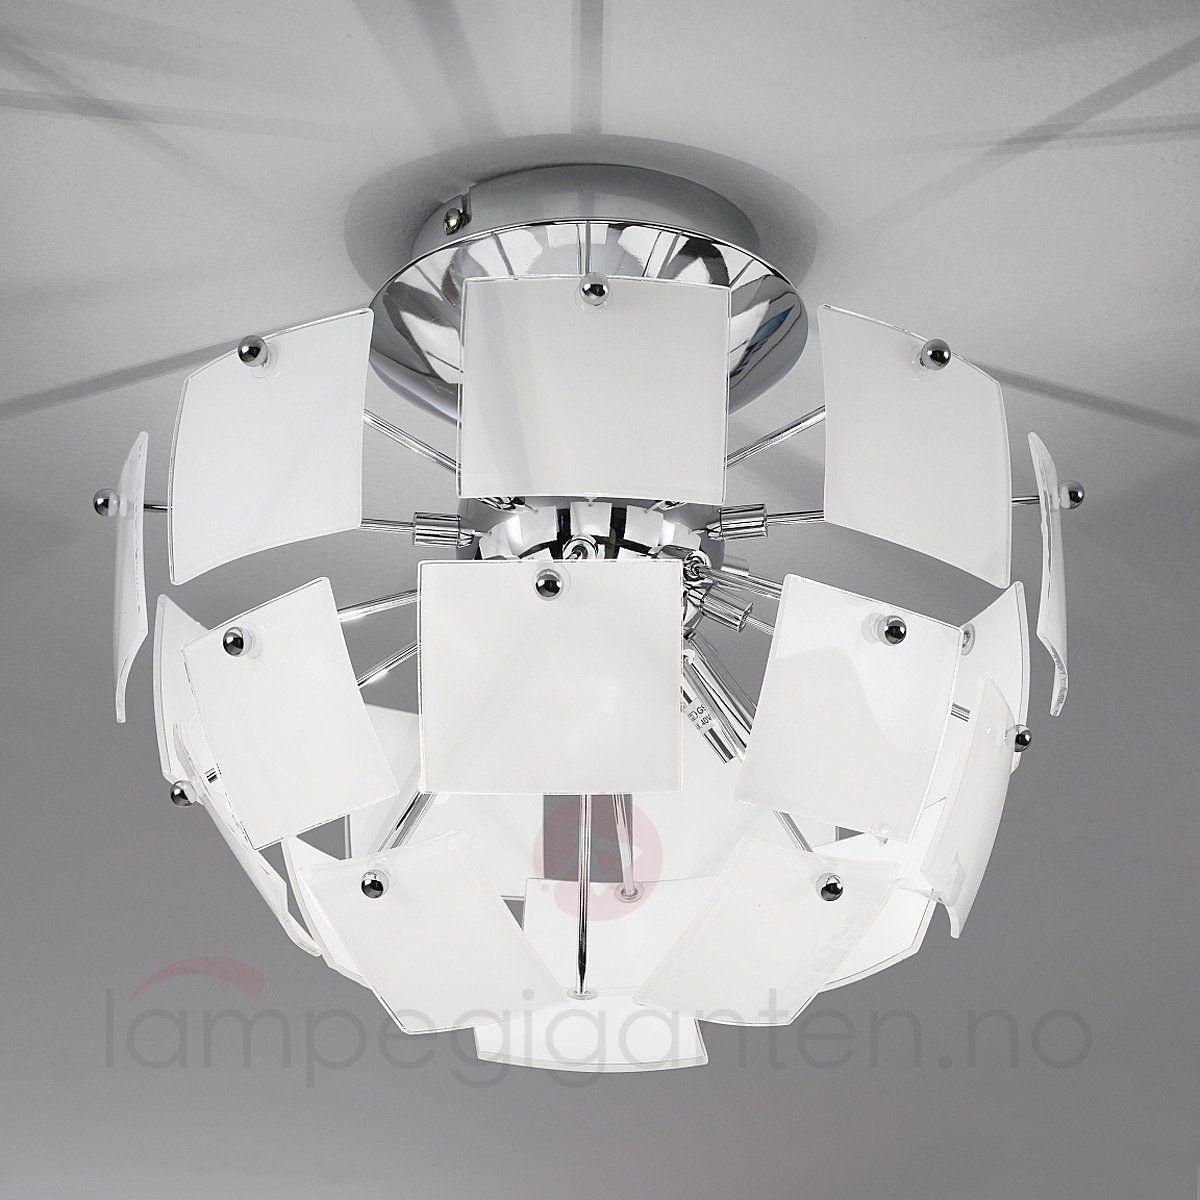 Ekstravagant URANIA taklampe i hvitt 3502171